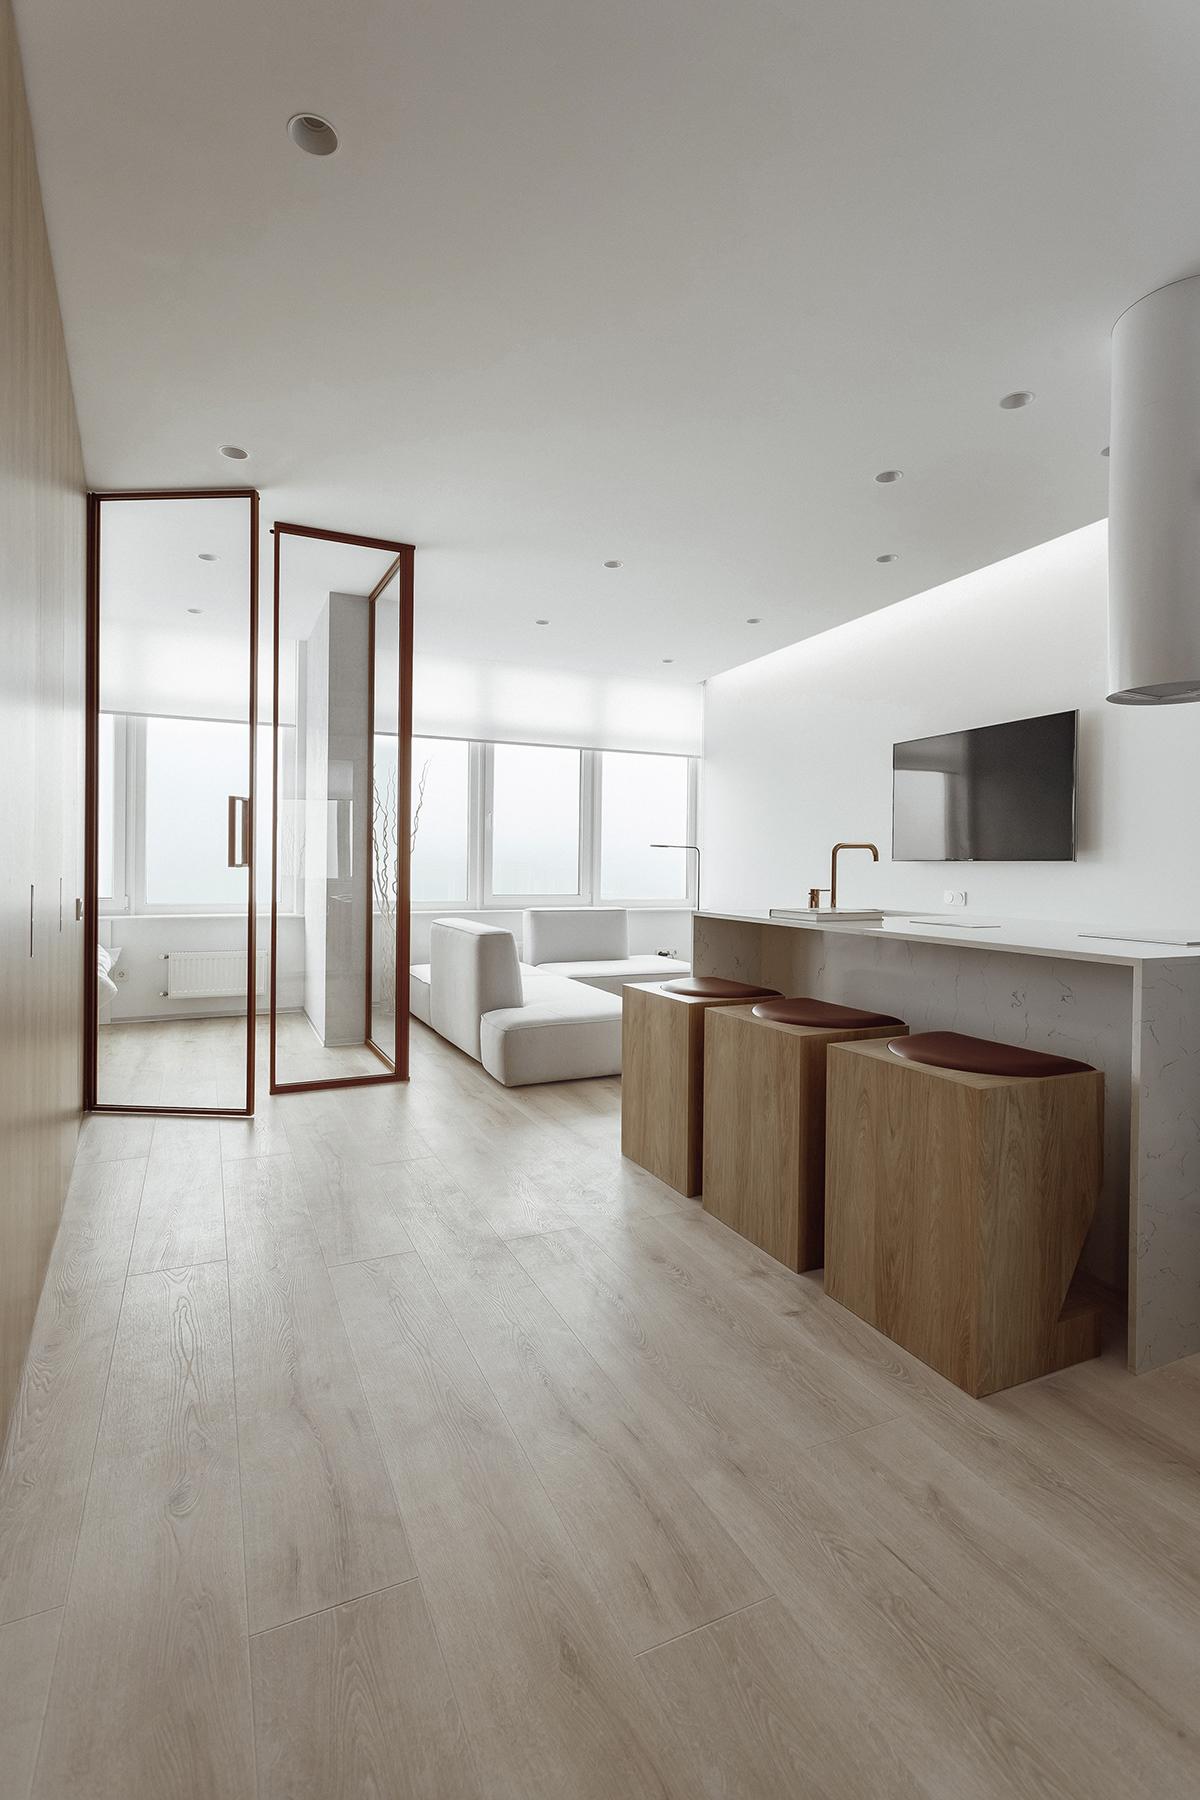 191 Apt by M3 Architects / via @kronekern